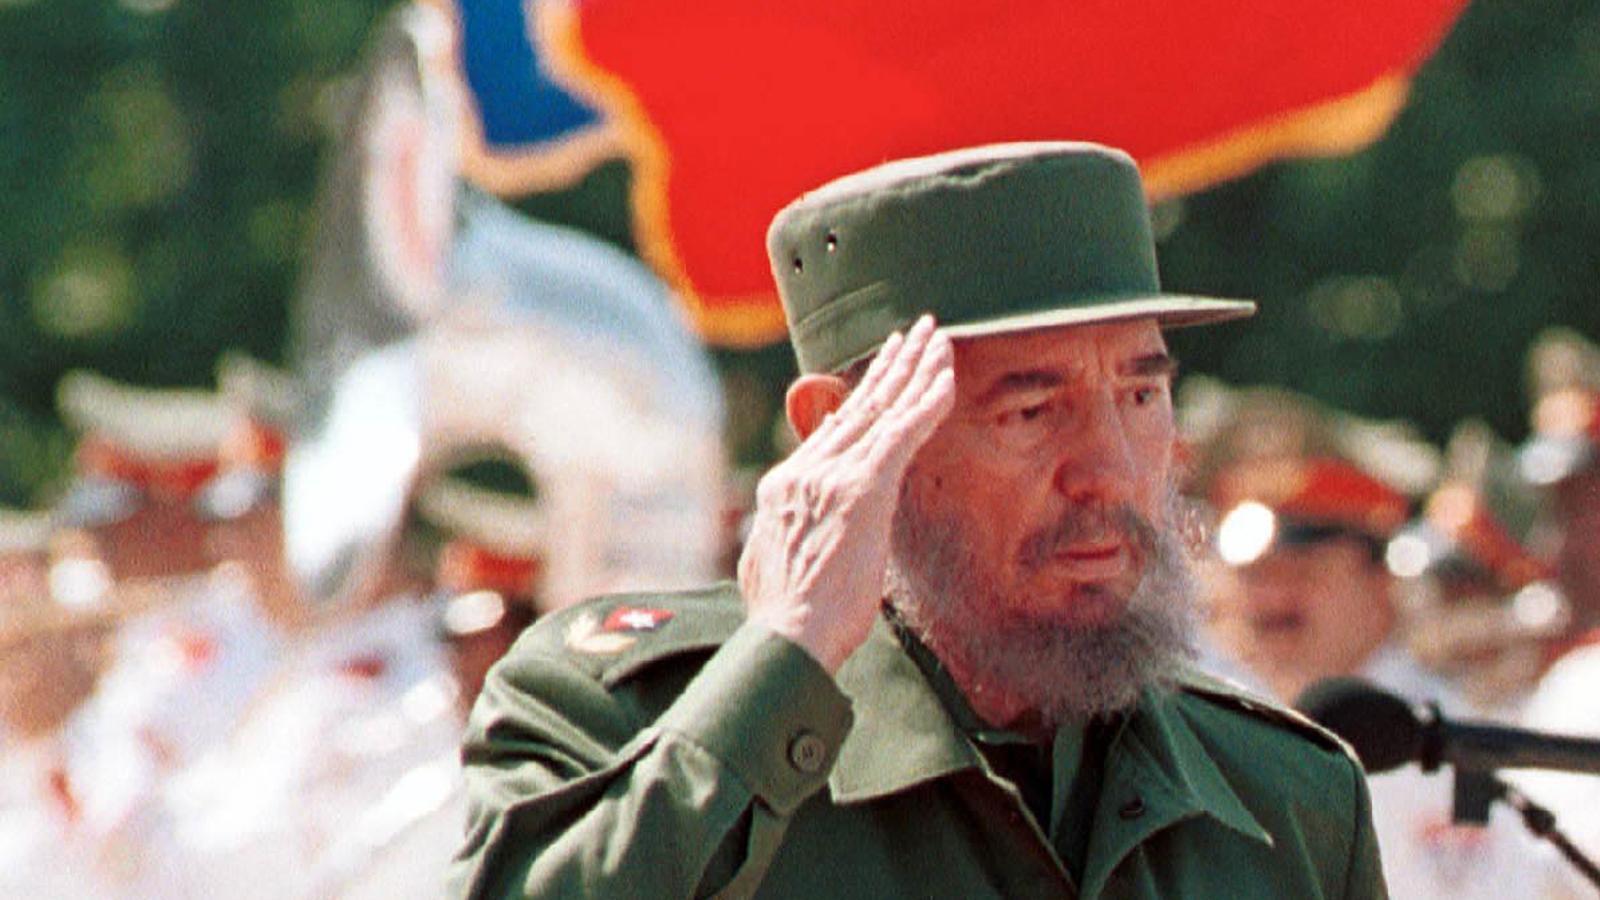 Les cares ocultes de Fidel Castro